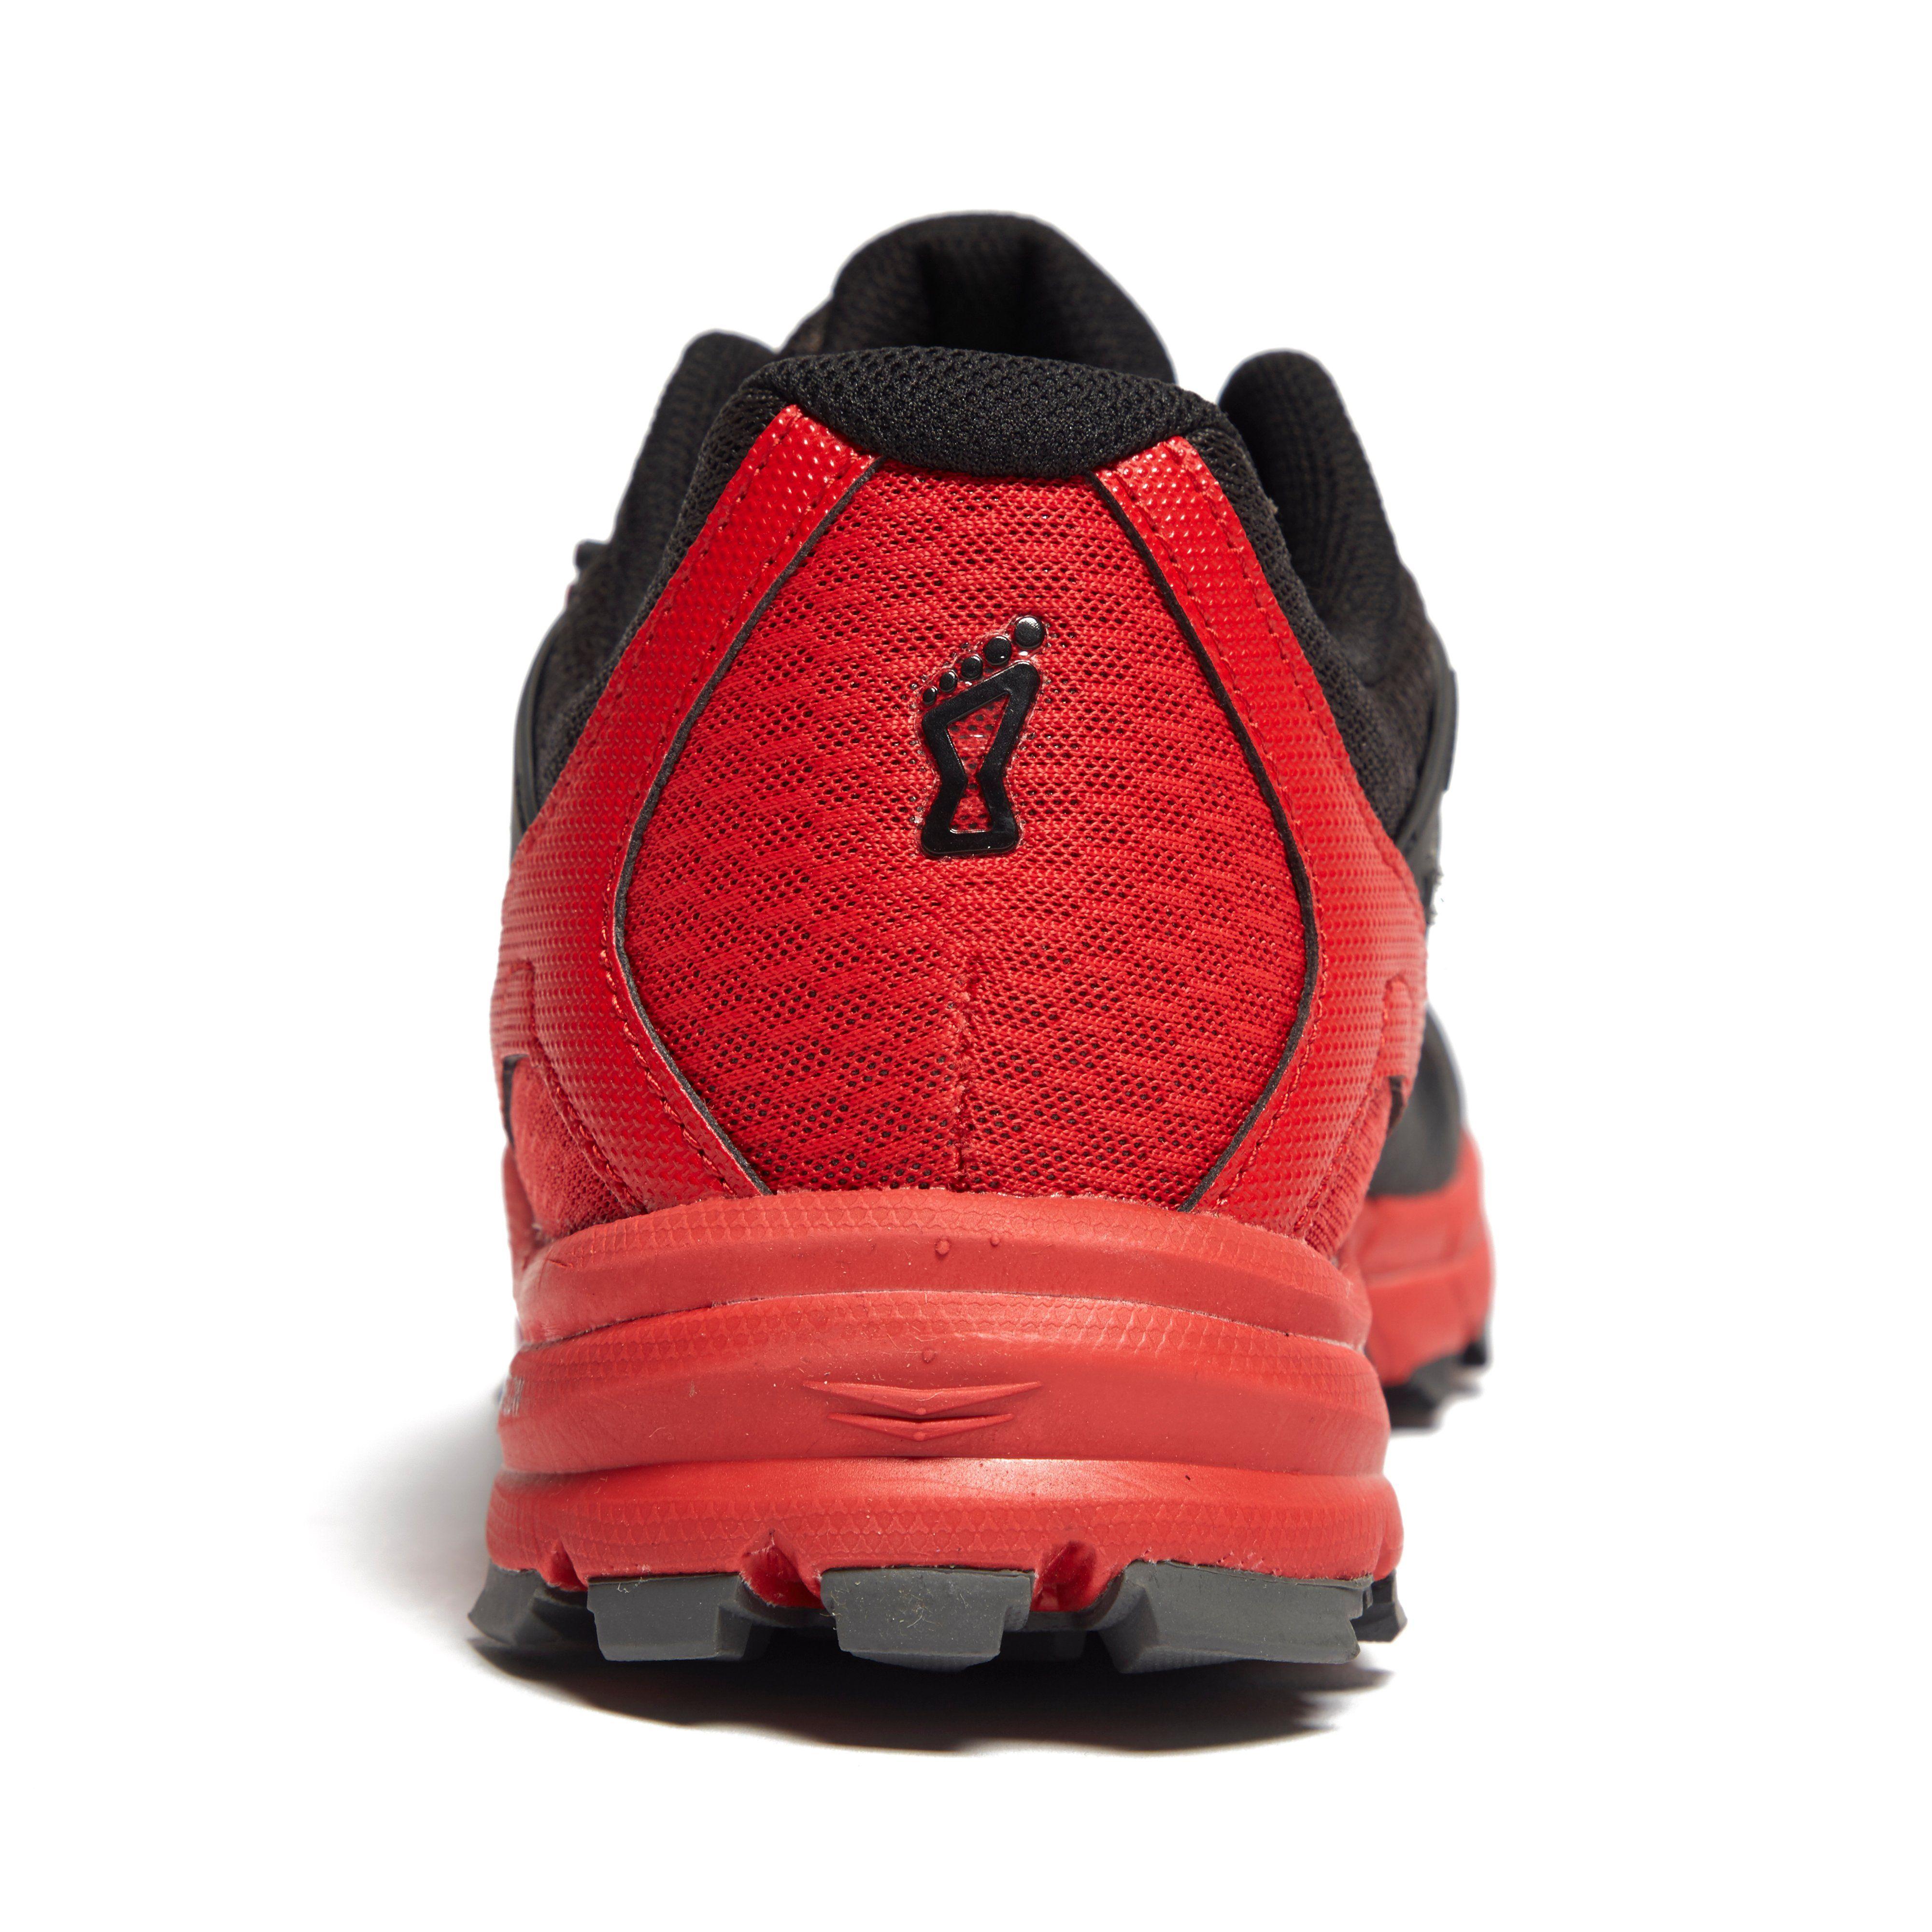 Inov-8 Trailtalon 290 Men's Running Shoes